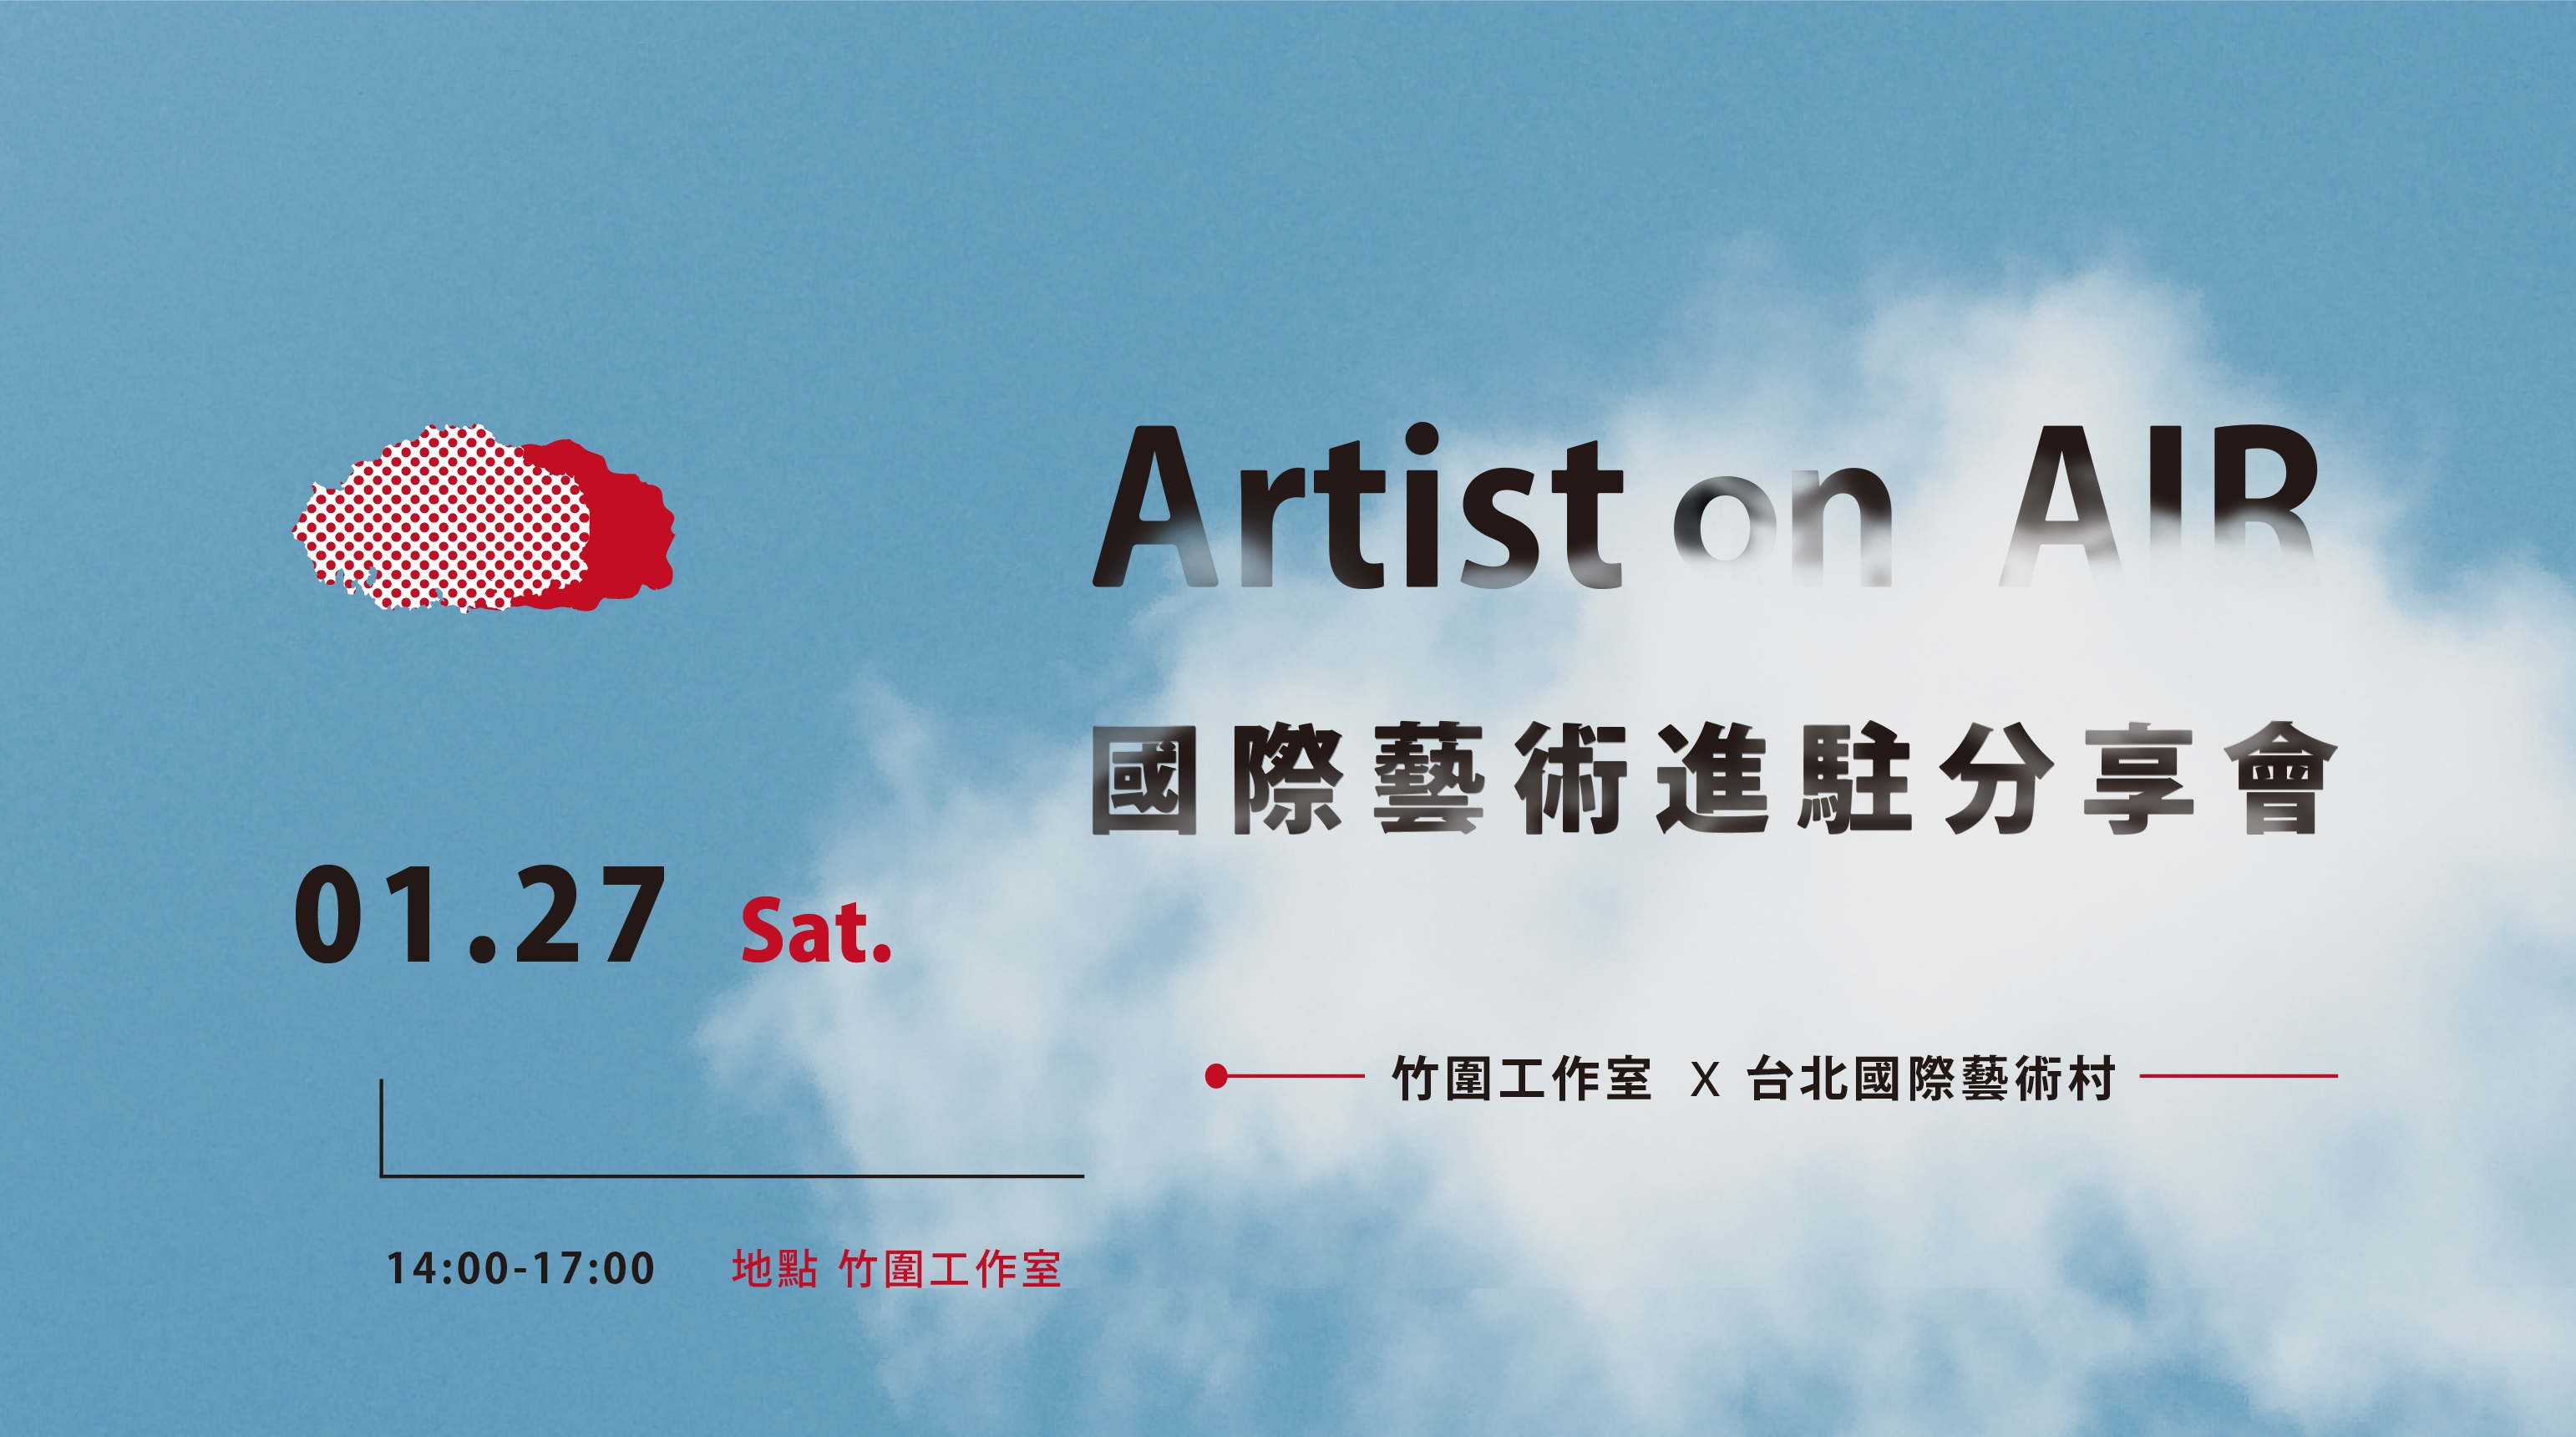 Artist on AIR 國際藝術進駐分享會